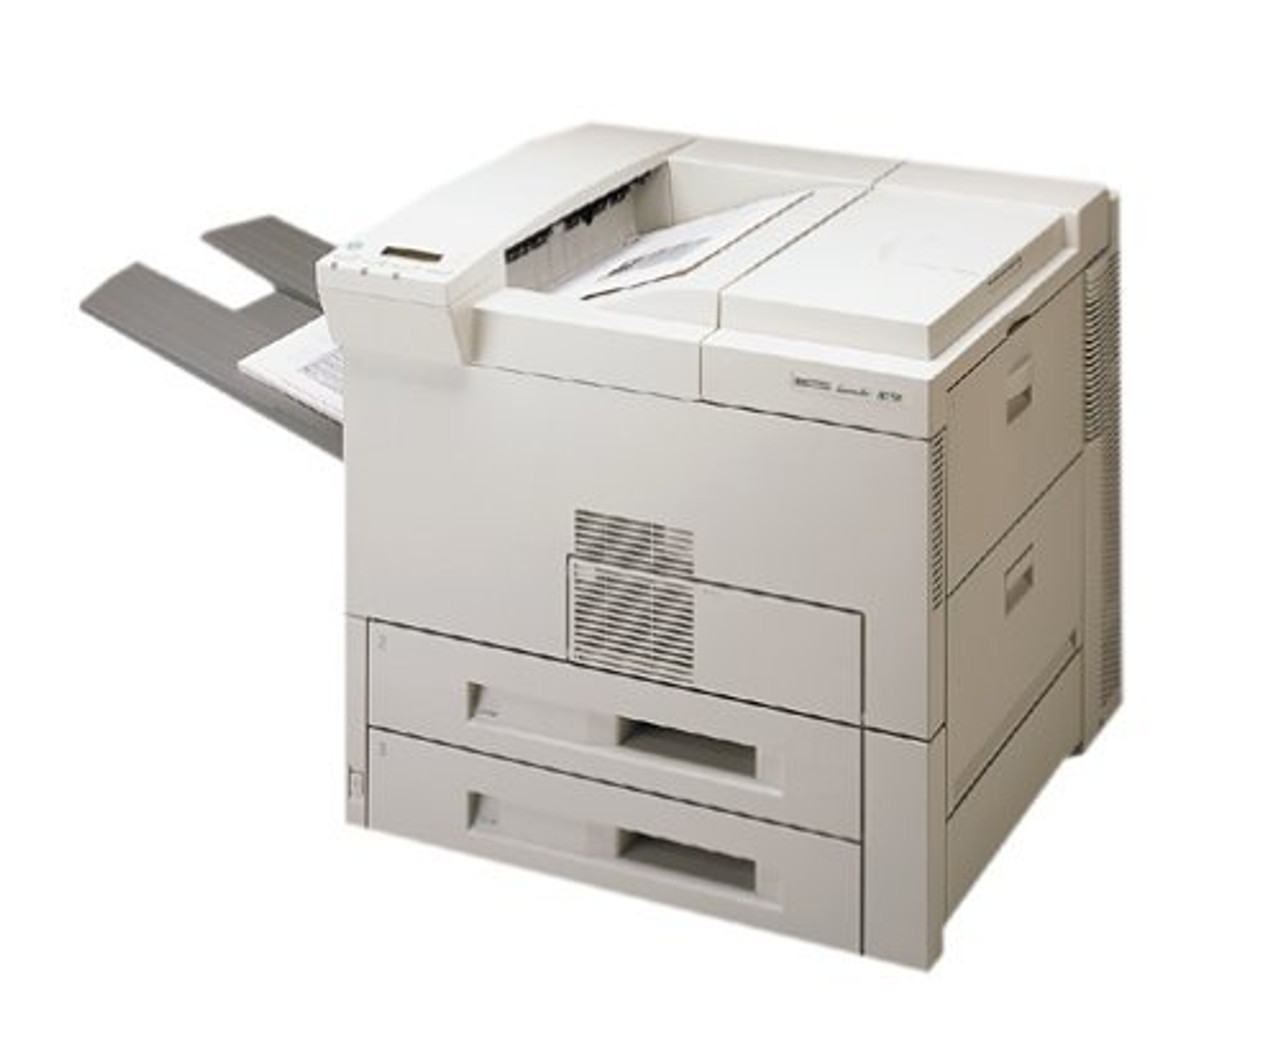 HP LaserJet 8150d - 8150D - 11x17 Laser Printer